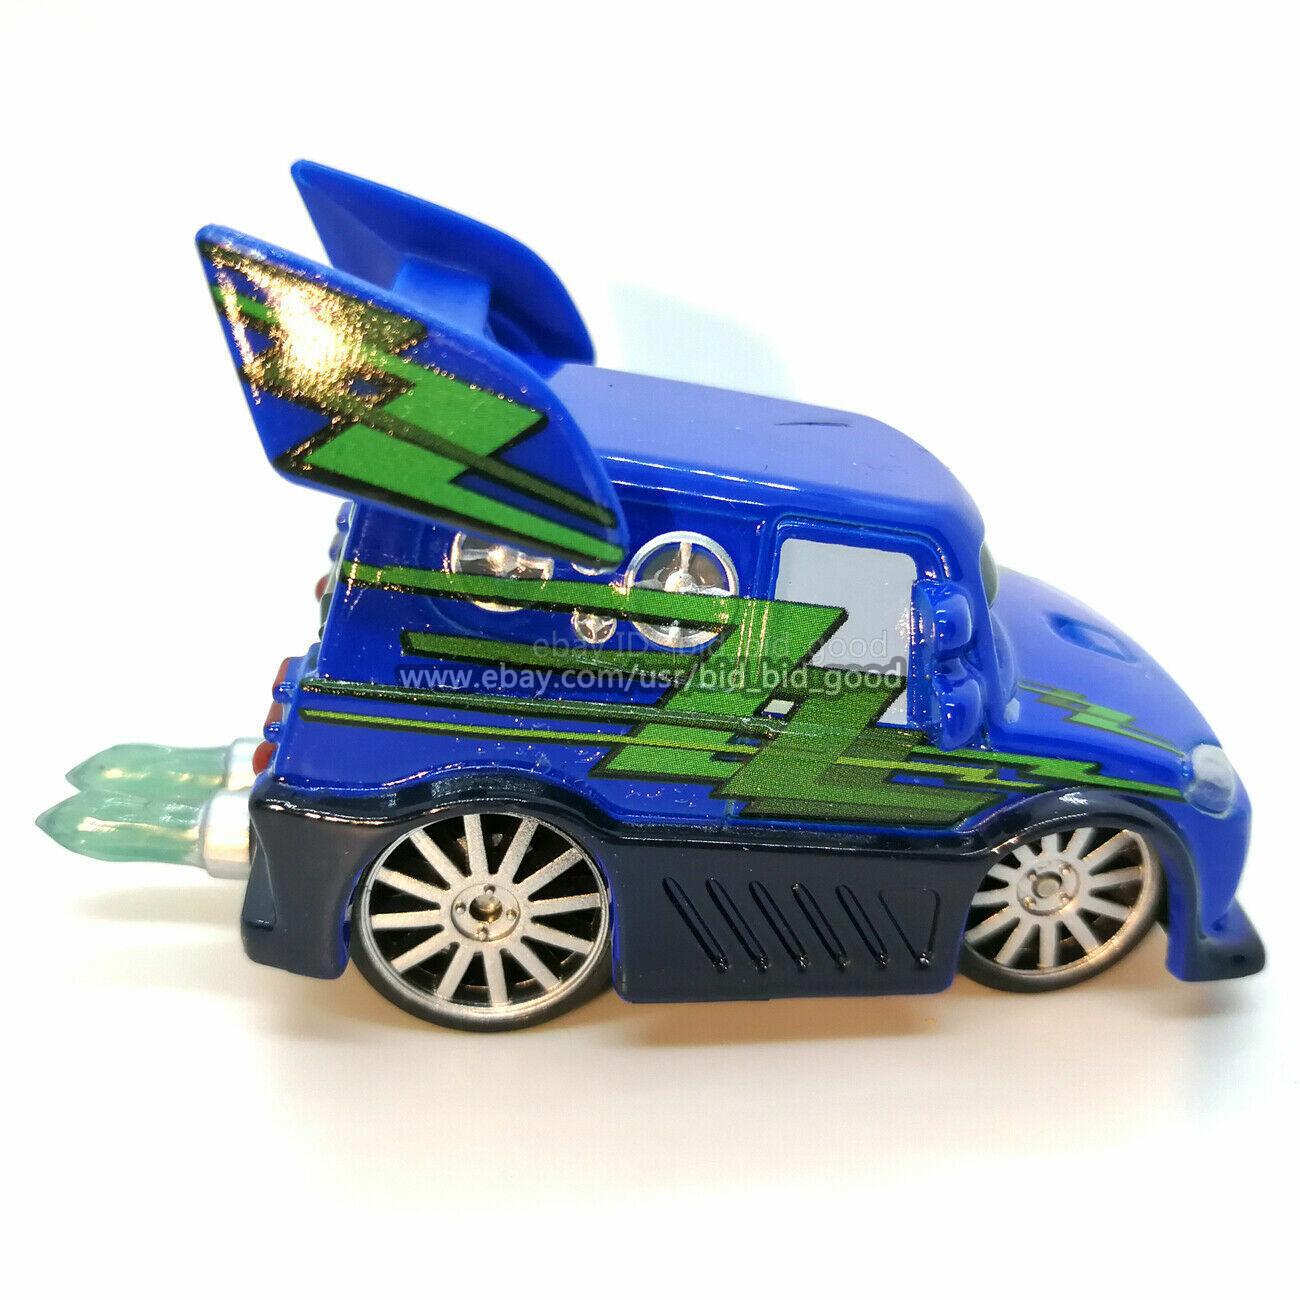 Mattel Cars 4pcs Set Disney Pixar Toy Car Boost DJ Wingo Snot Rod Diecast Loose